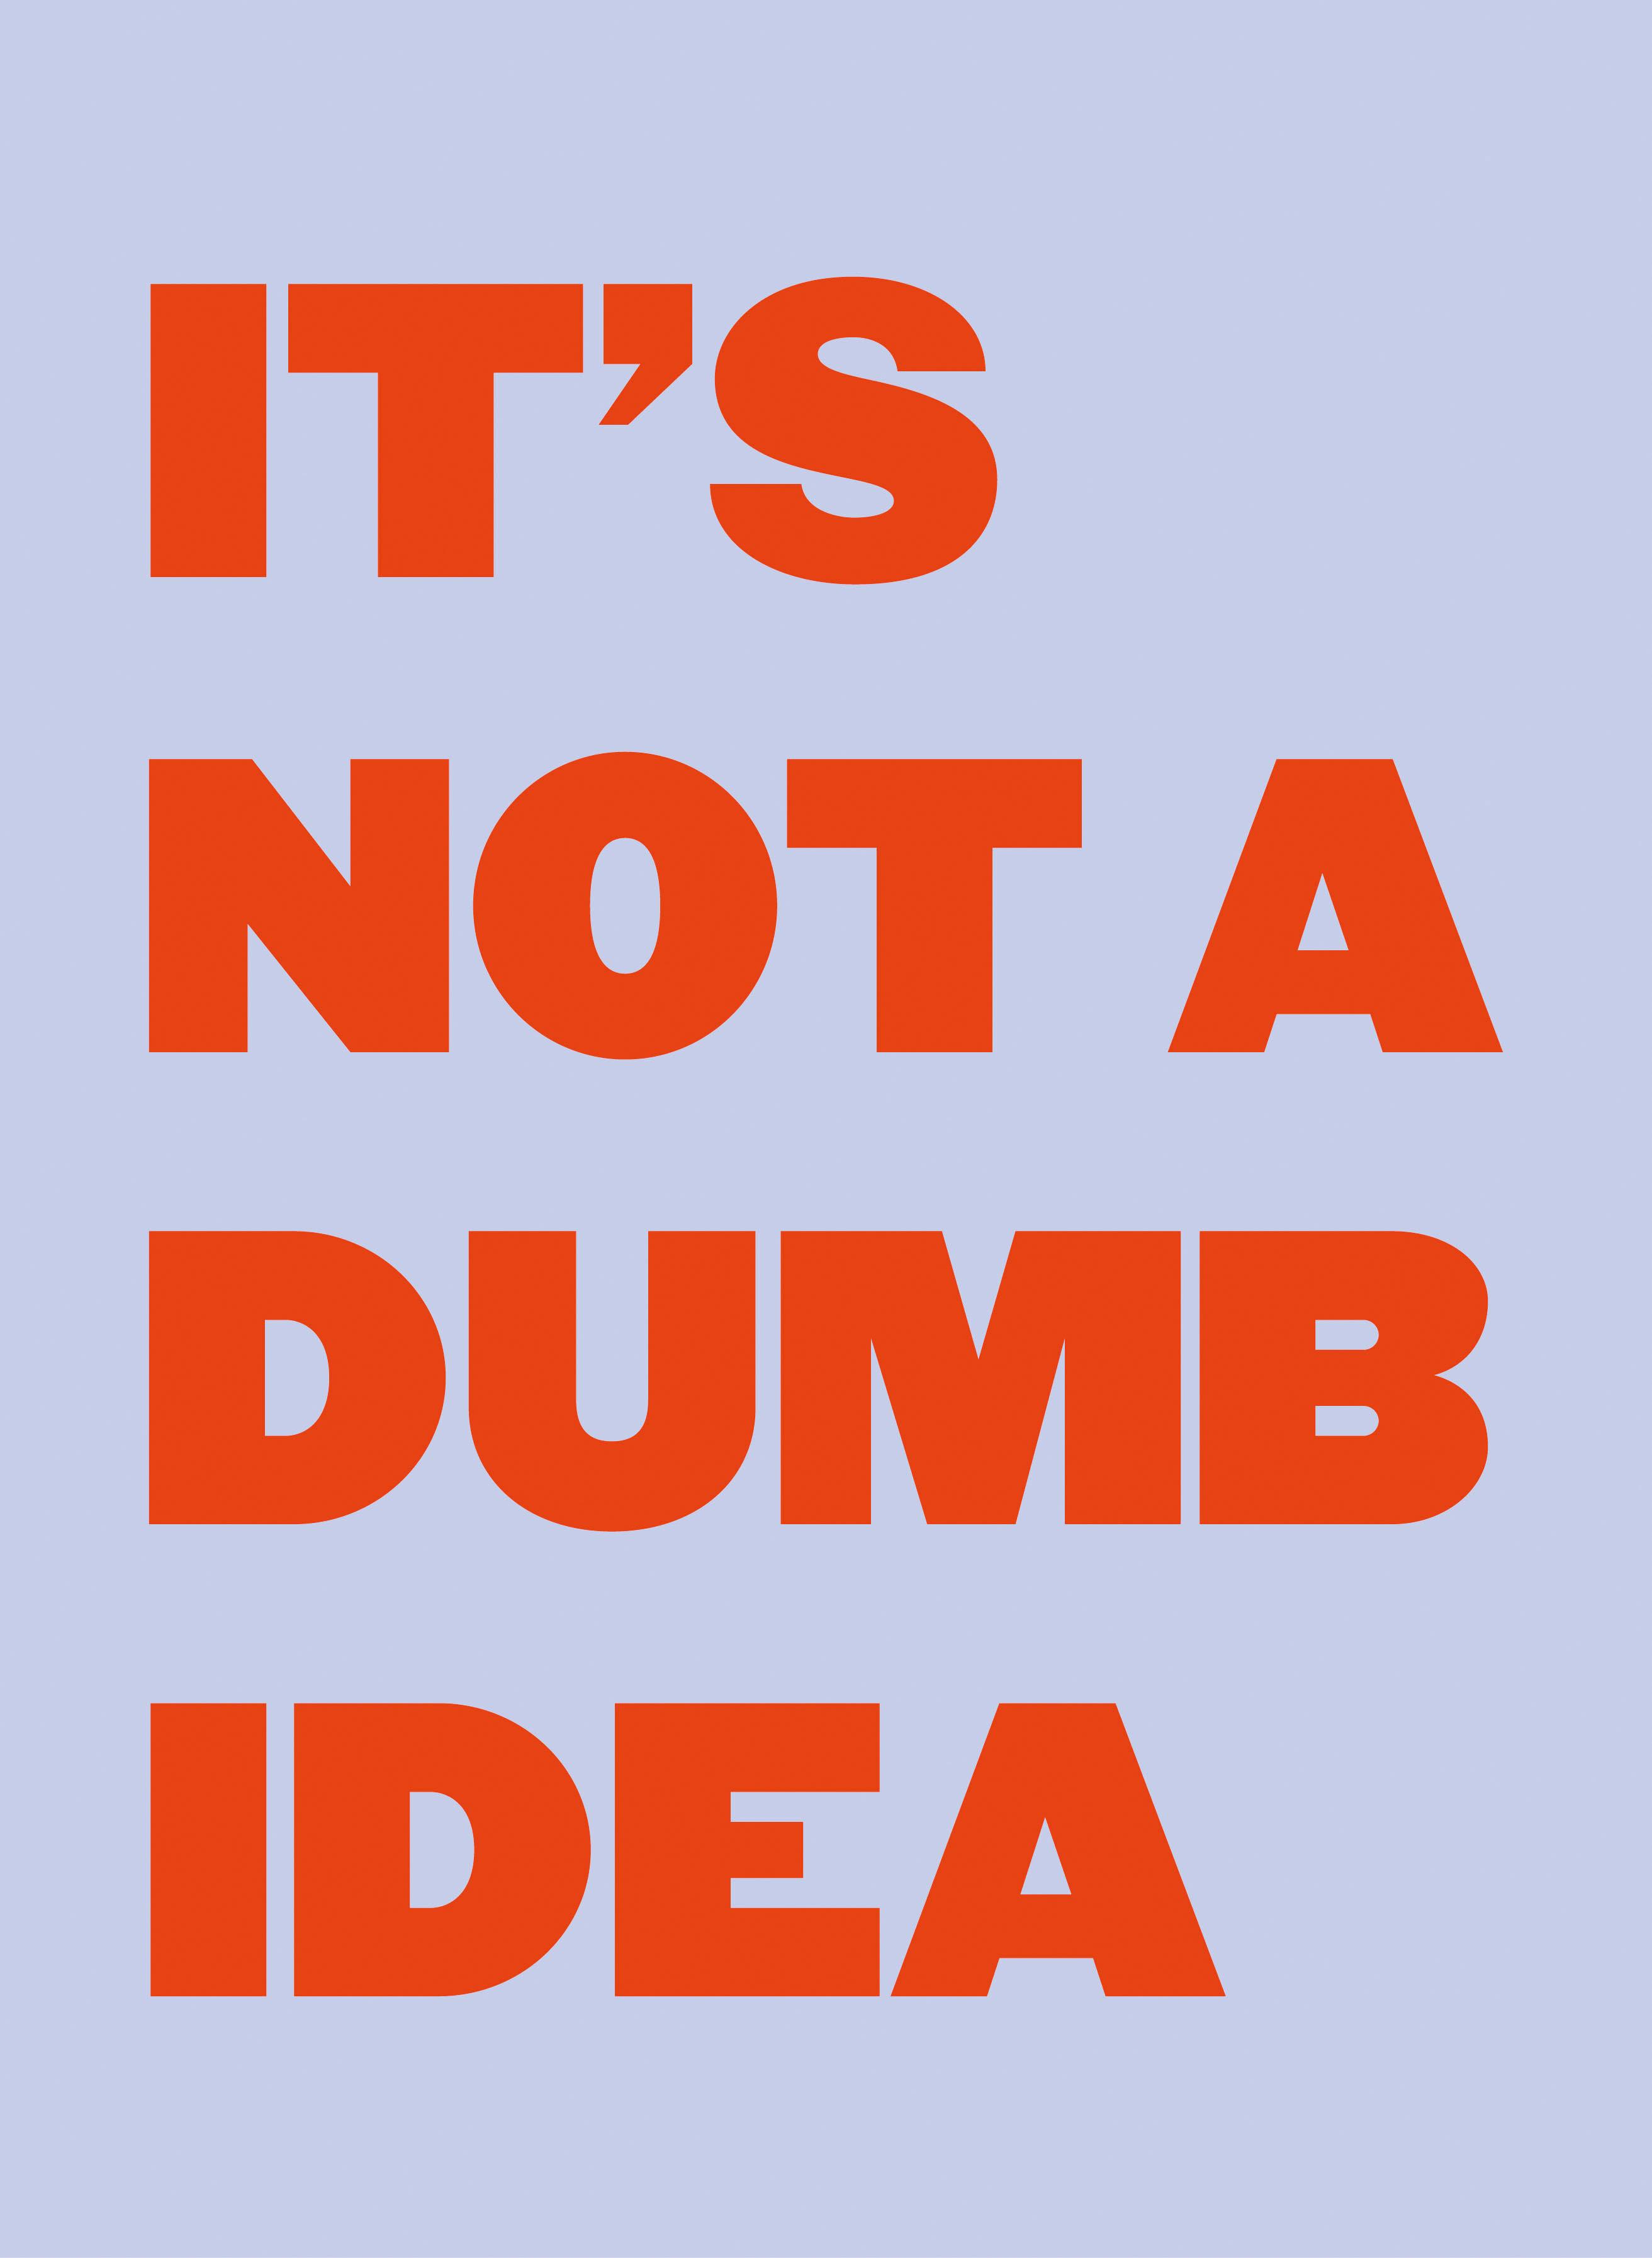 not_dumb_idea_Caroline_71